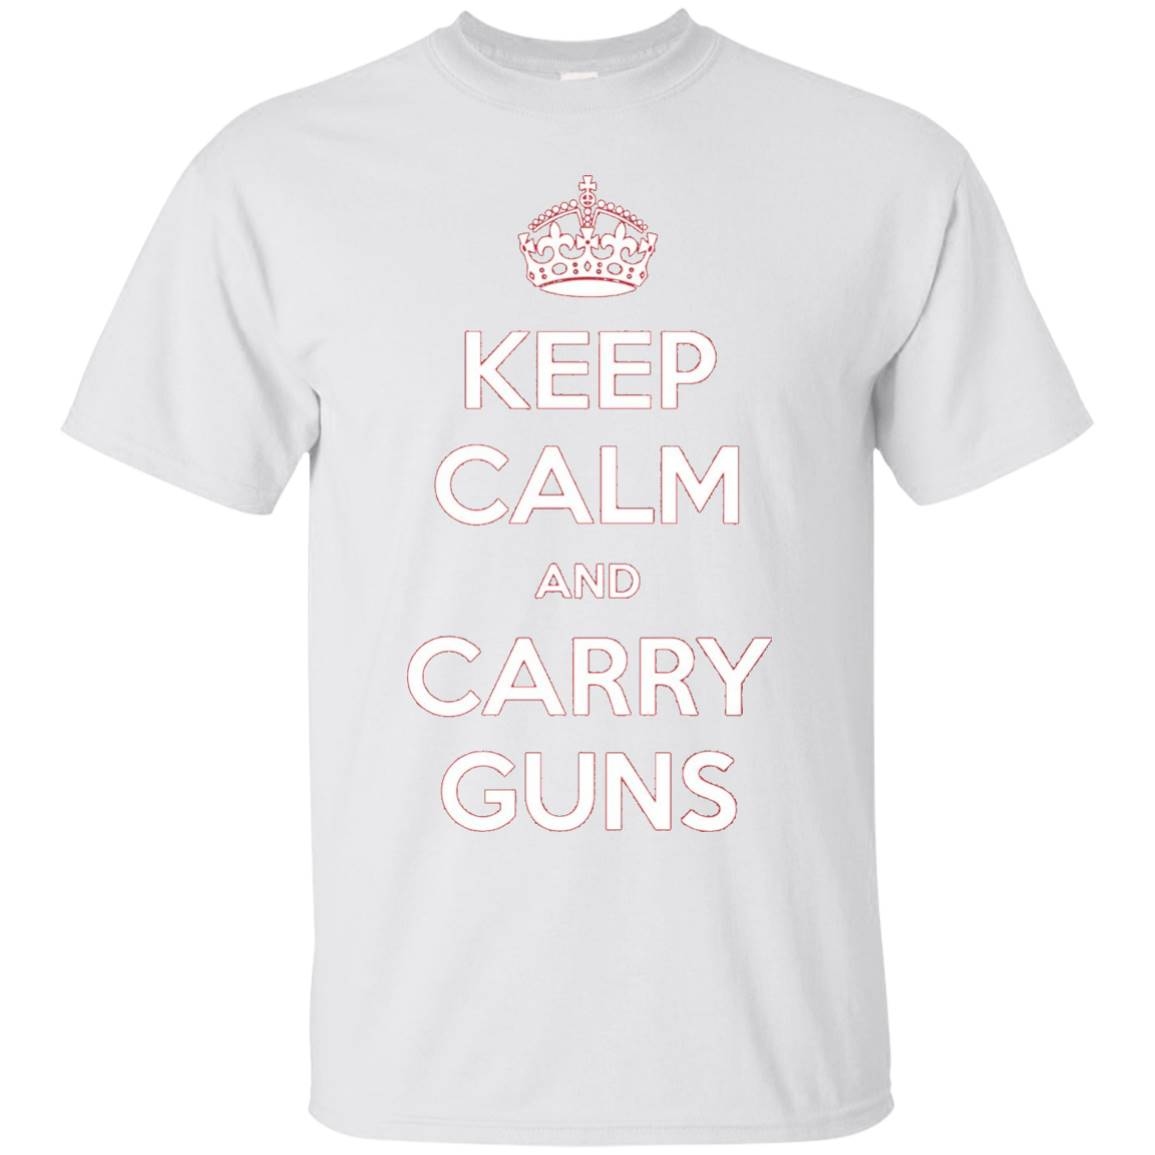 Keep Calm and Carry Guns T-Shirt